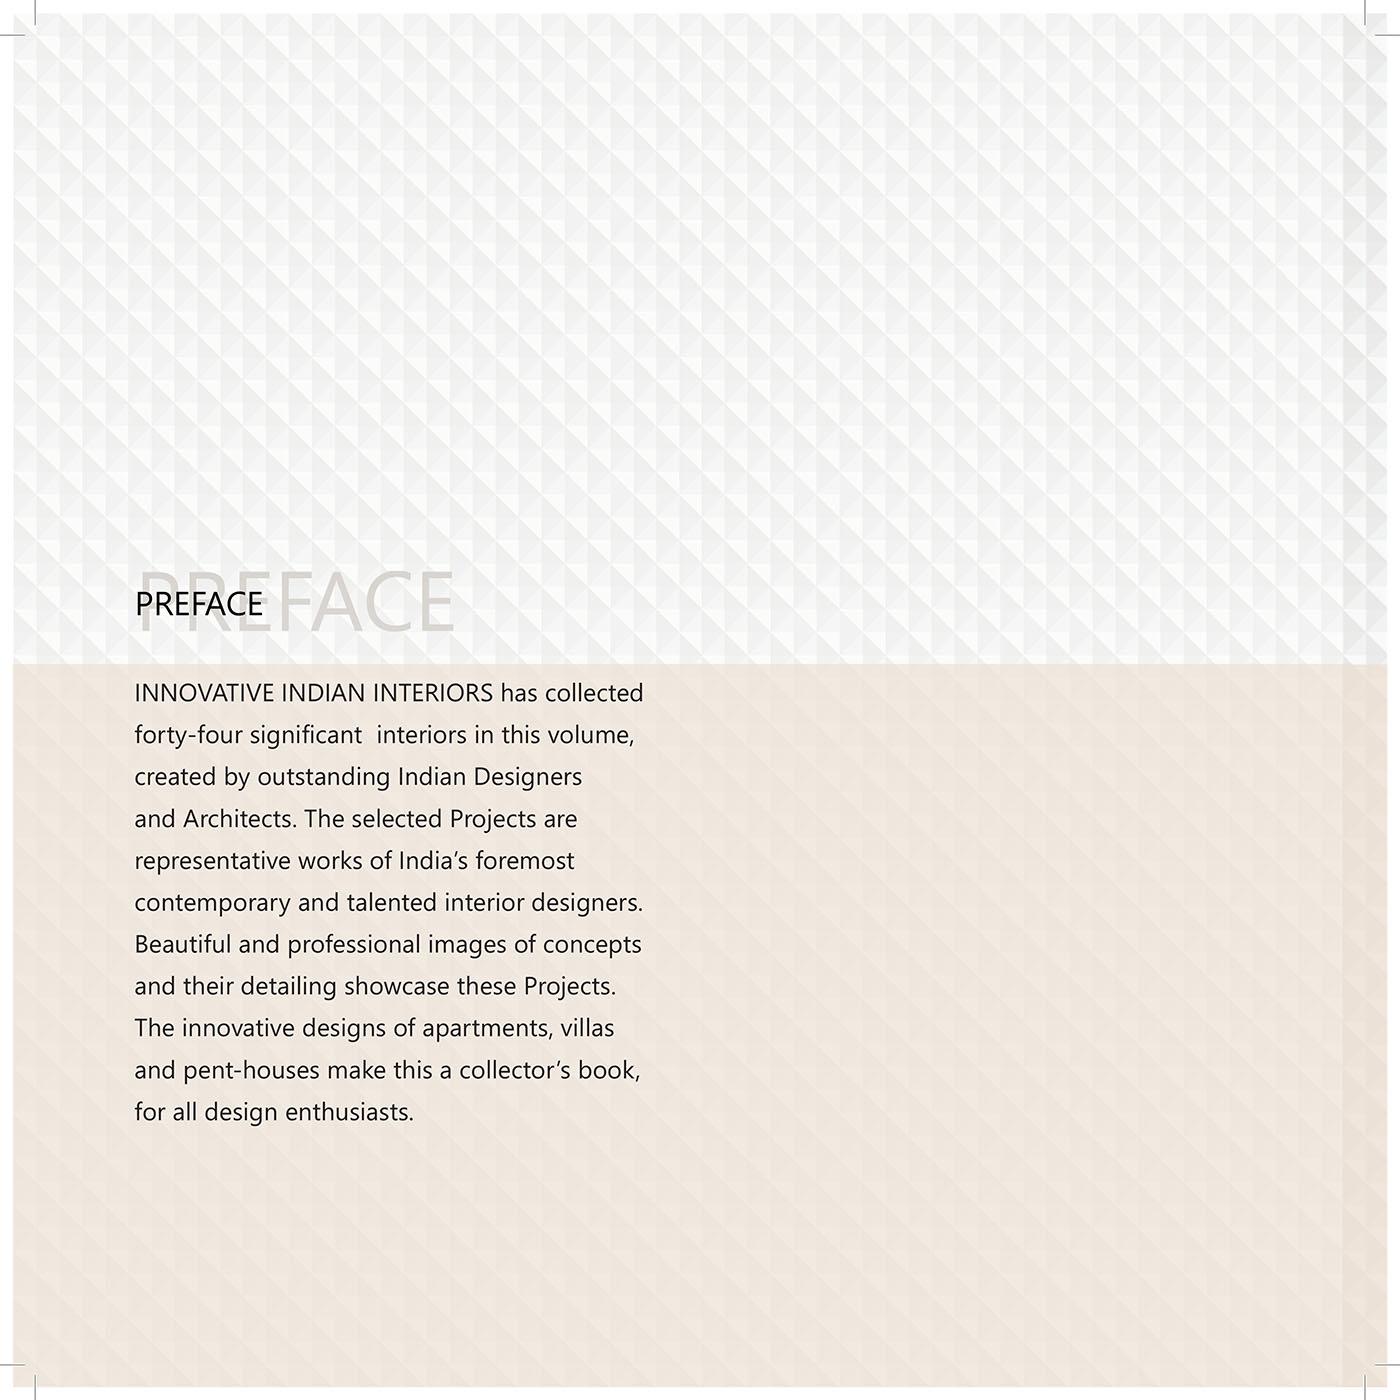 Convert JPG to PDF online – convert-jpg-to-pdf.net